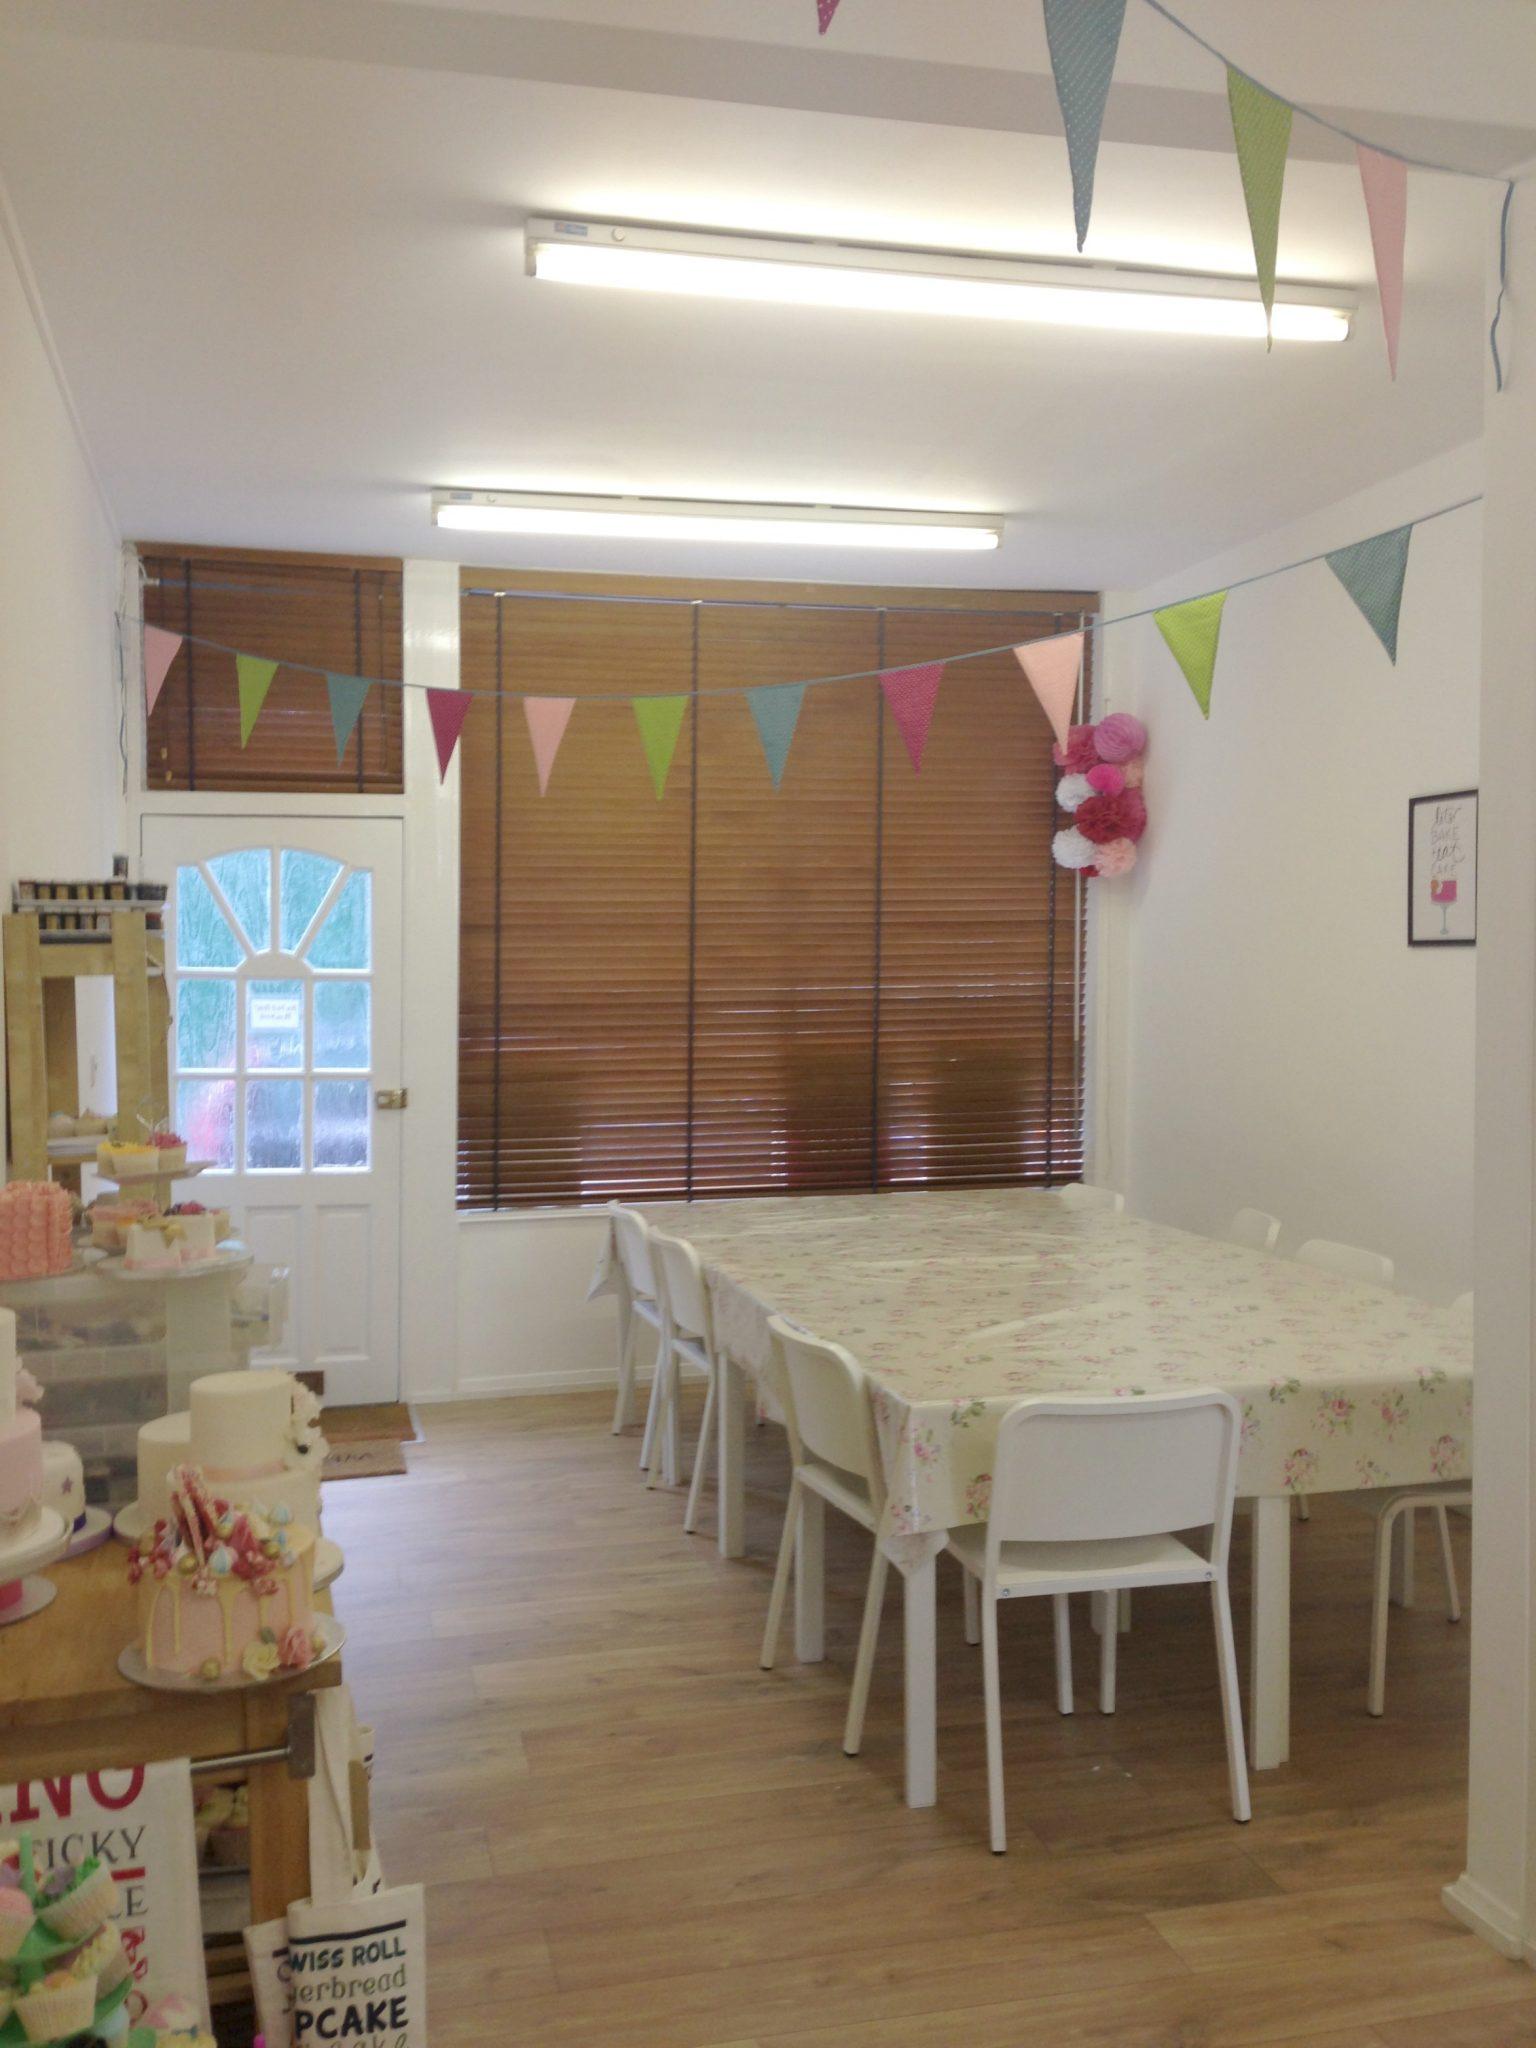 Our Venue – Teaching Area